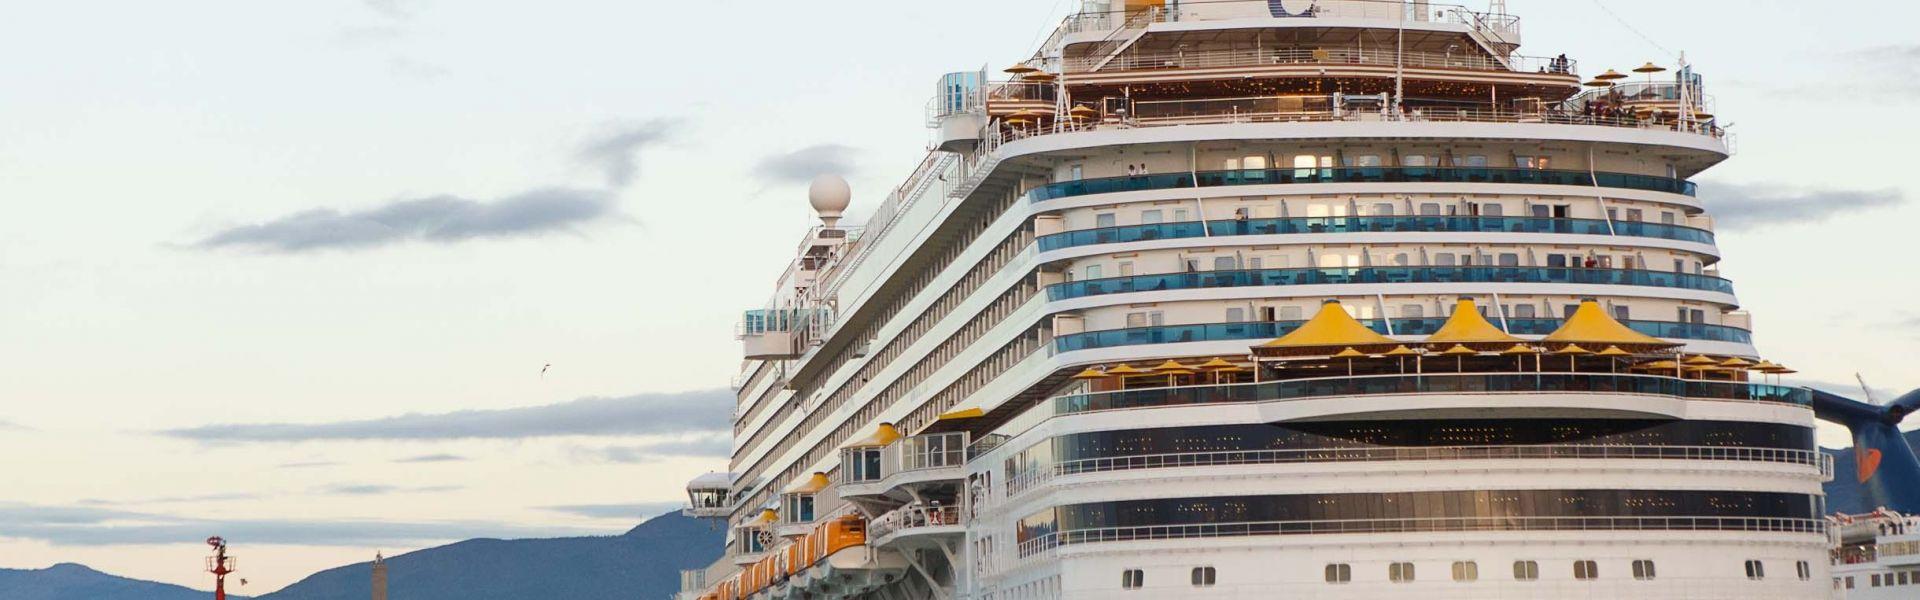 Croaziera 2018 - Mediterana de Vest (Savona) - Costa Cruises - Costa Diadema - 3 nopti